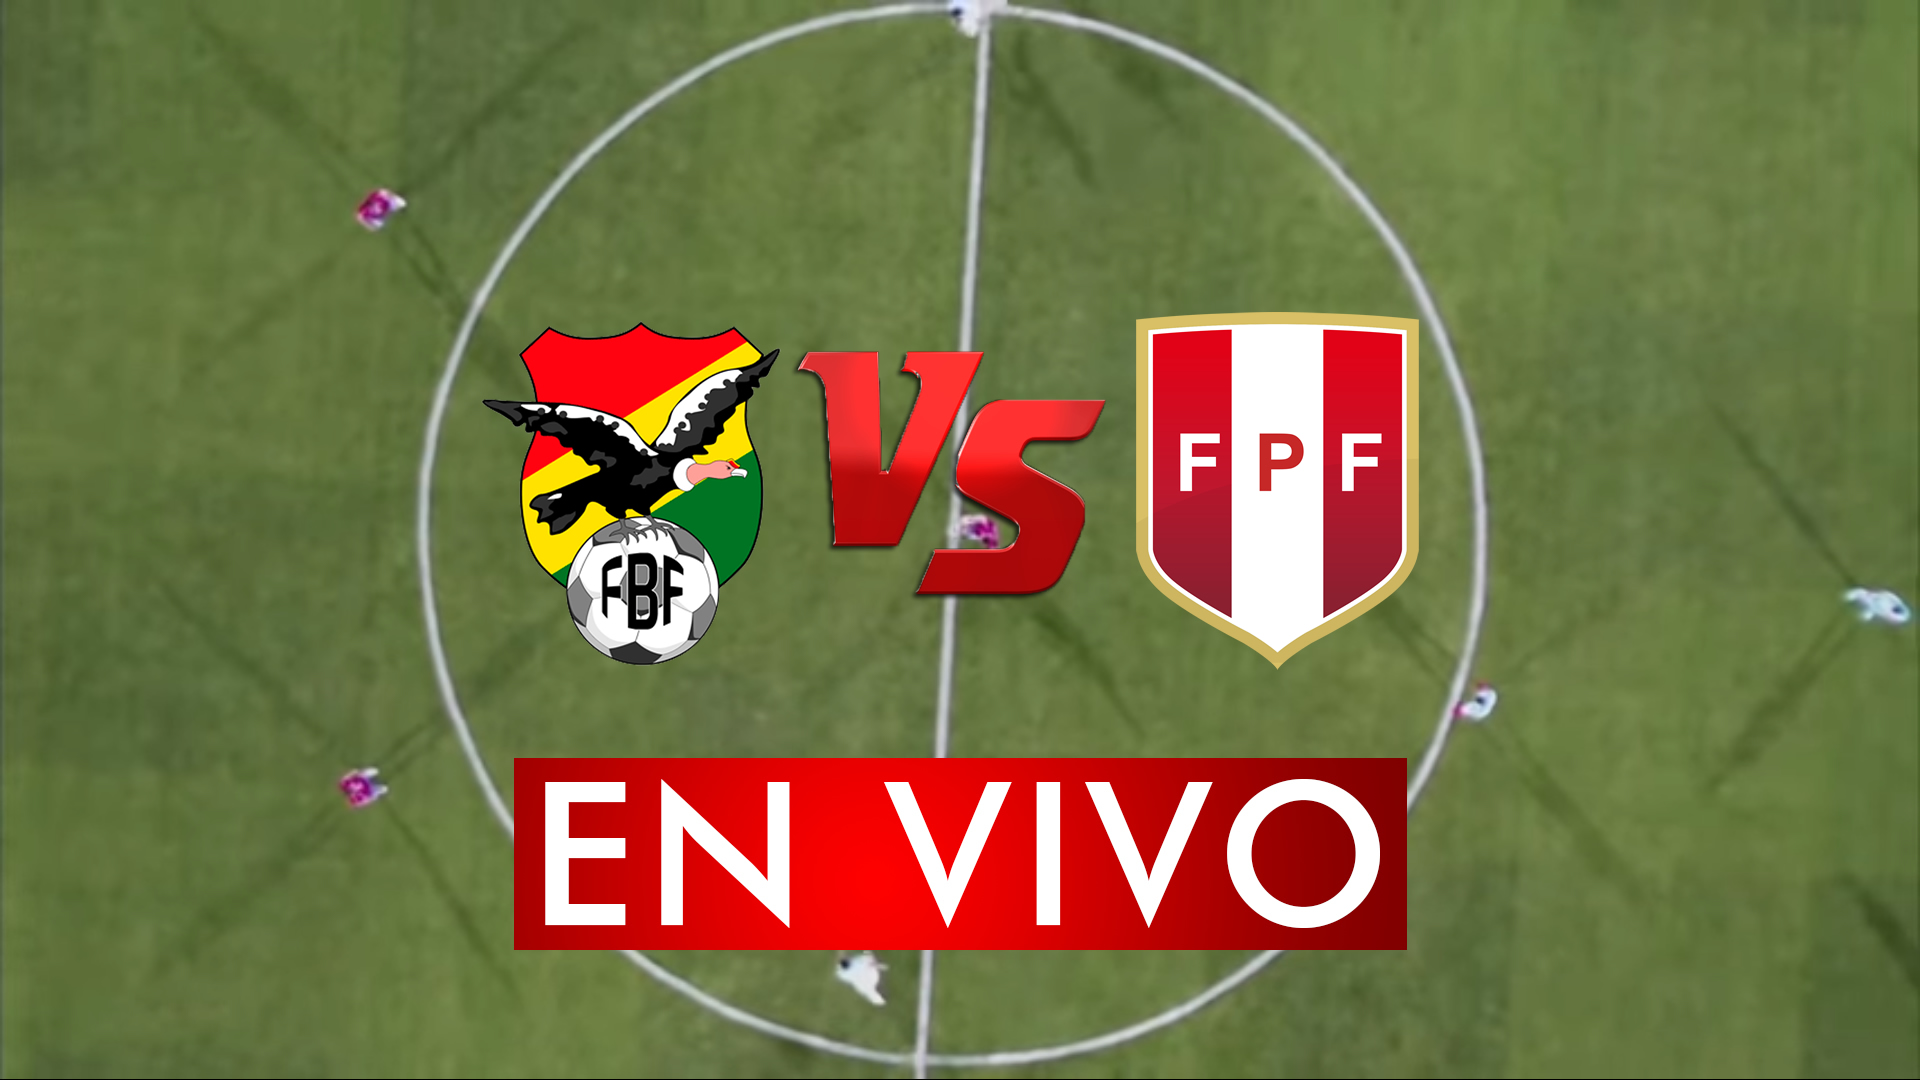 Bolivia vs Perú En Vivo Online Live Streaming Preolimpico